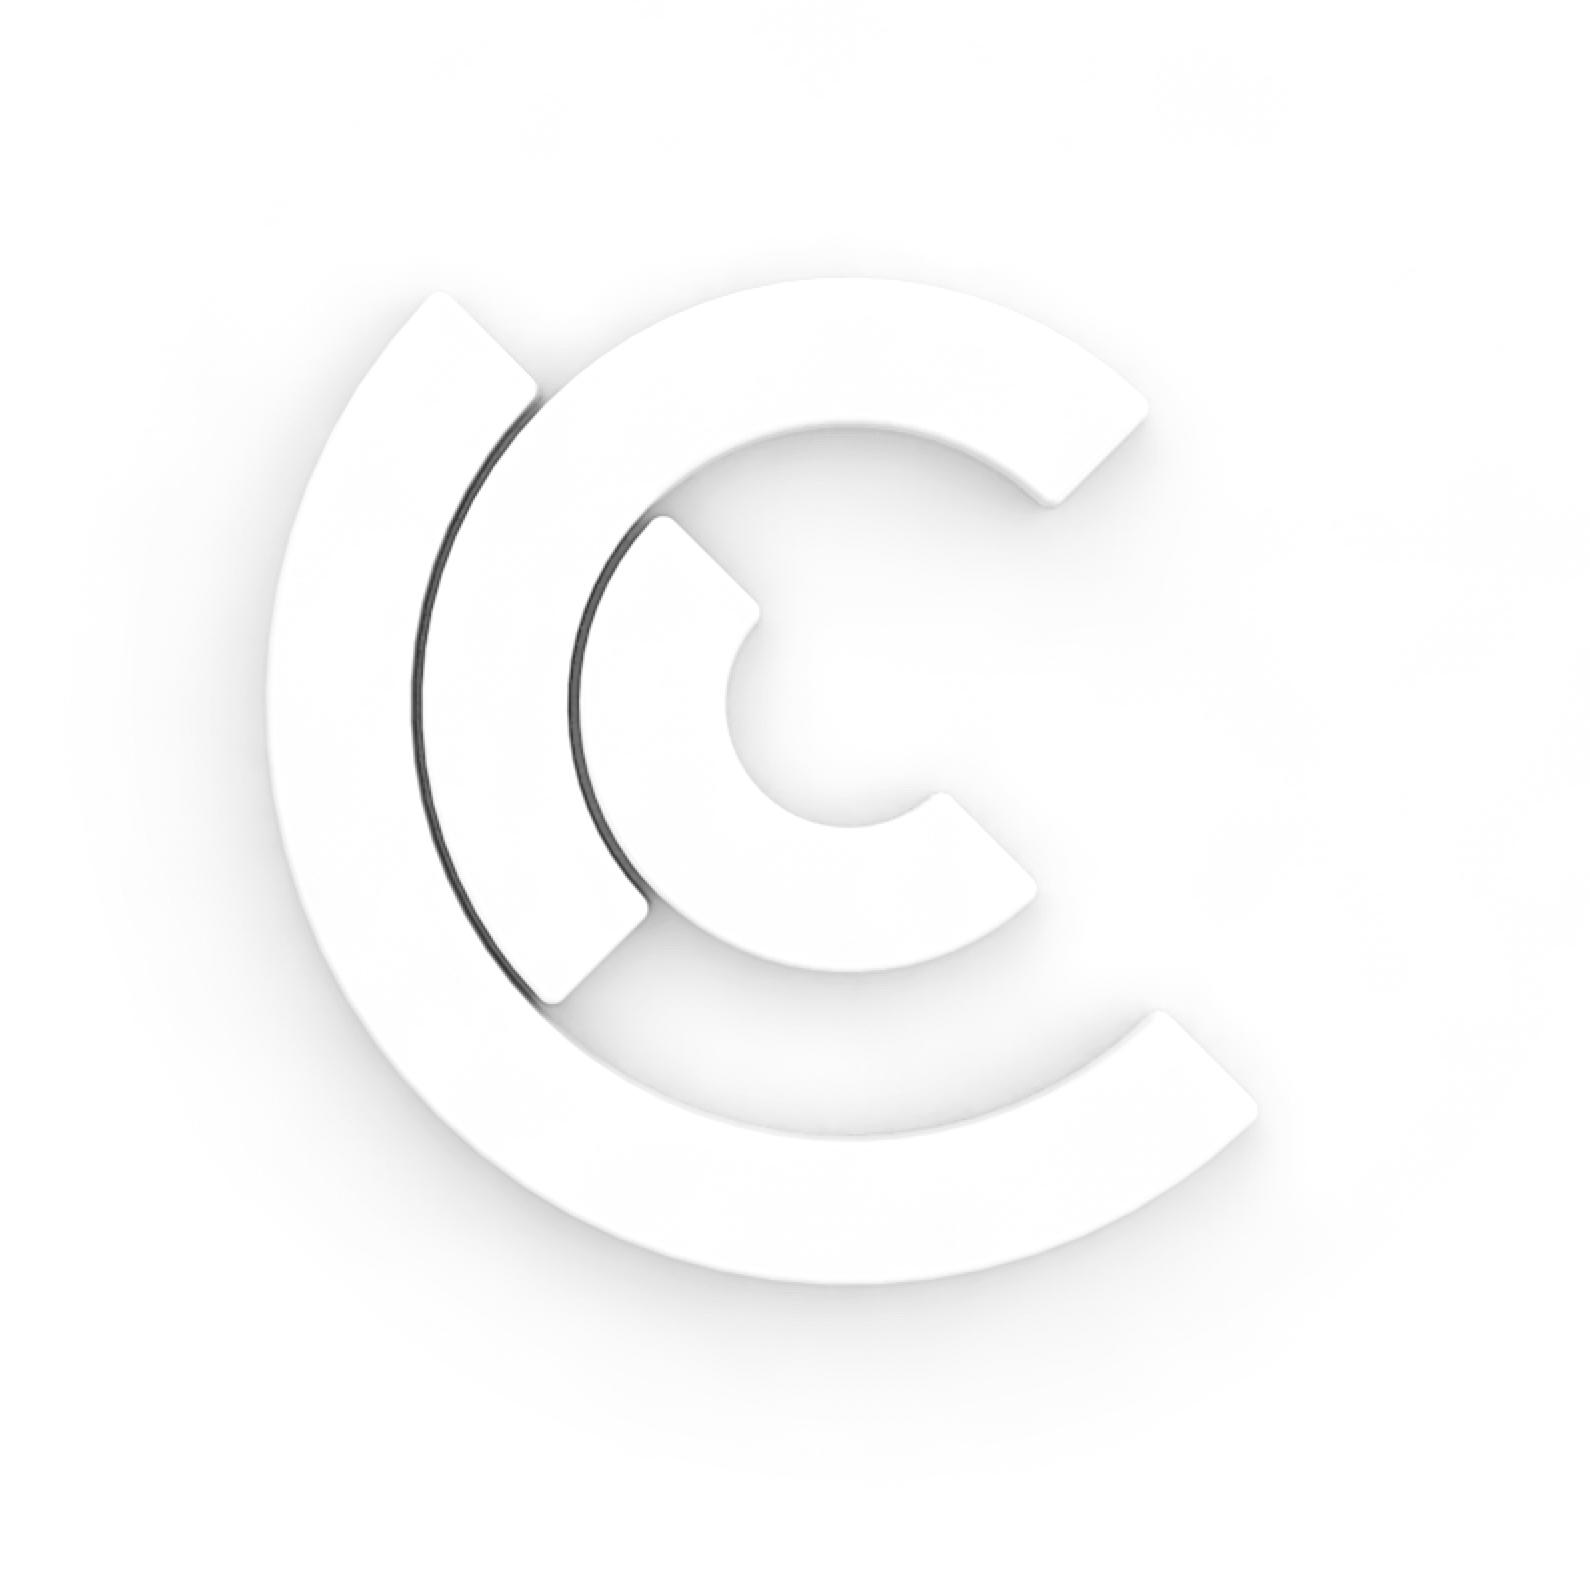 Clark Fixtures Extrusion logo